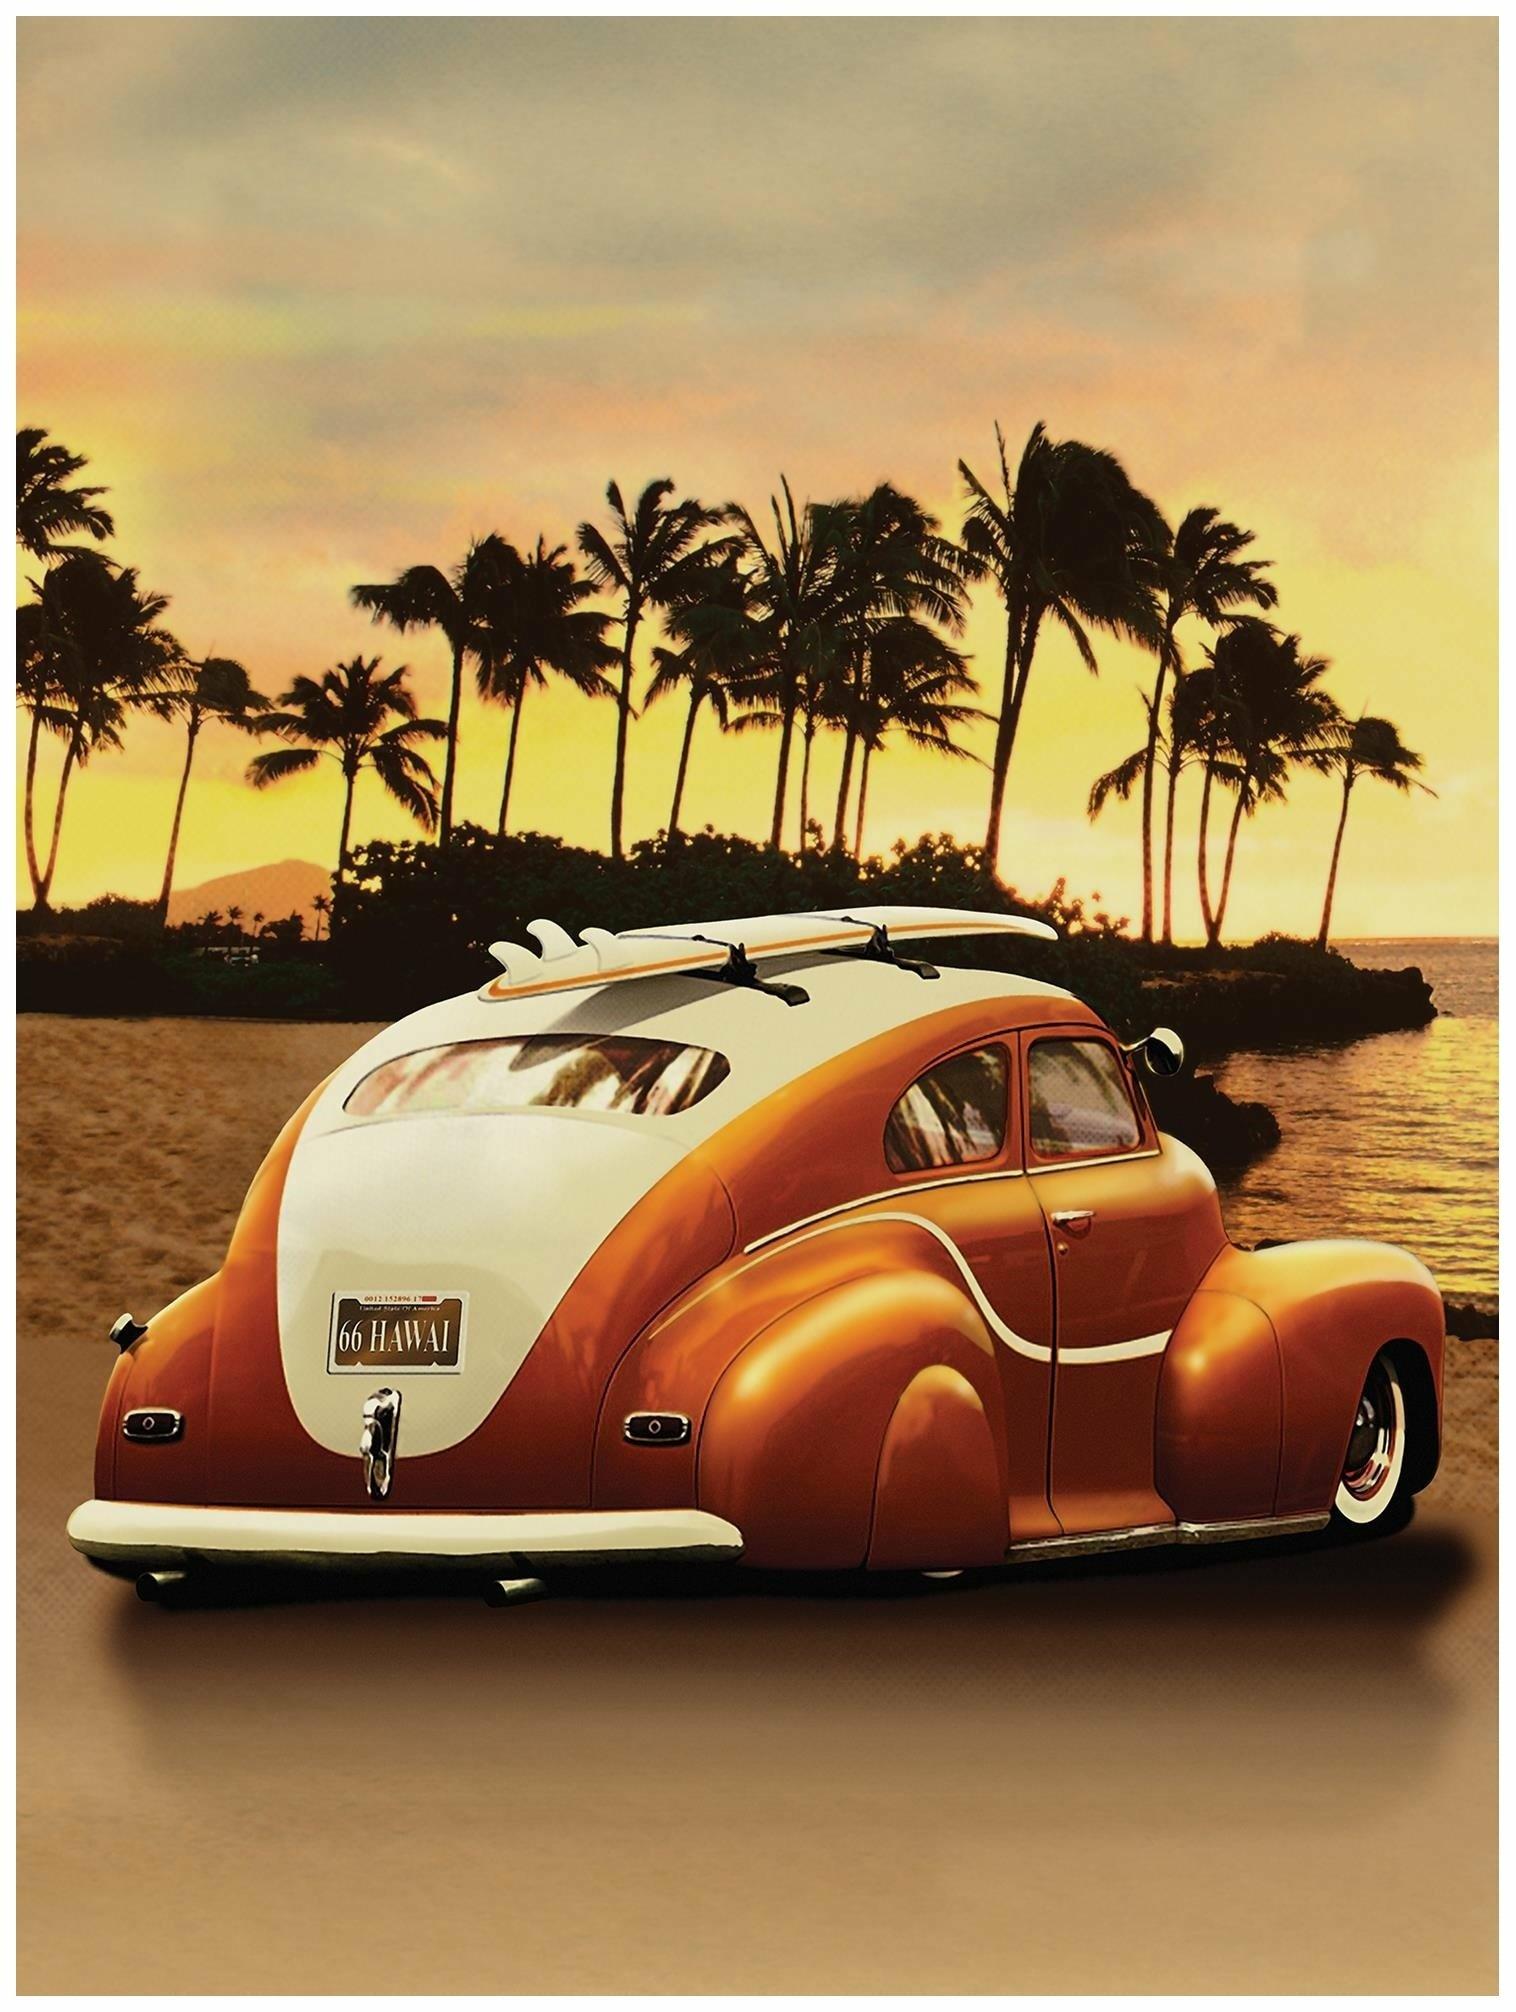 Fototapeta plaża palmy samochód fototapety